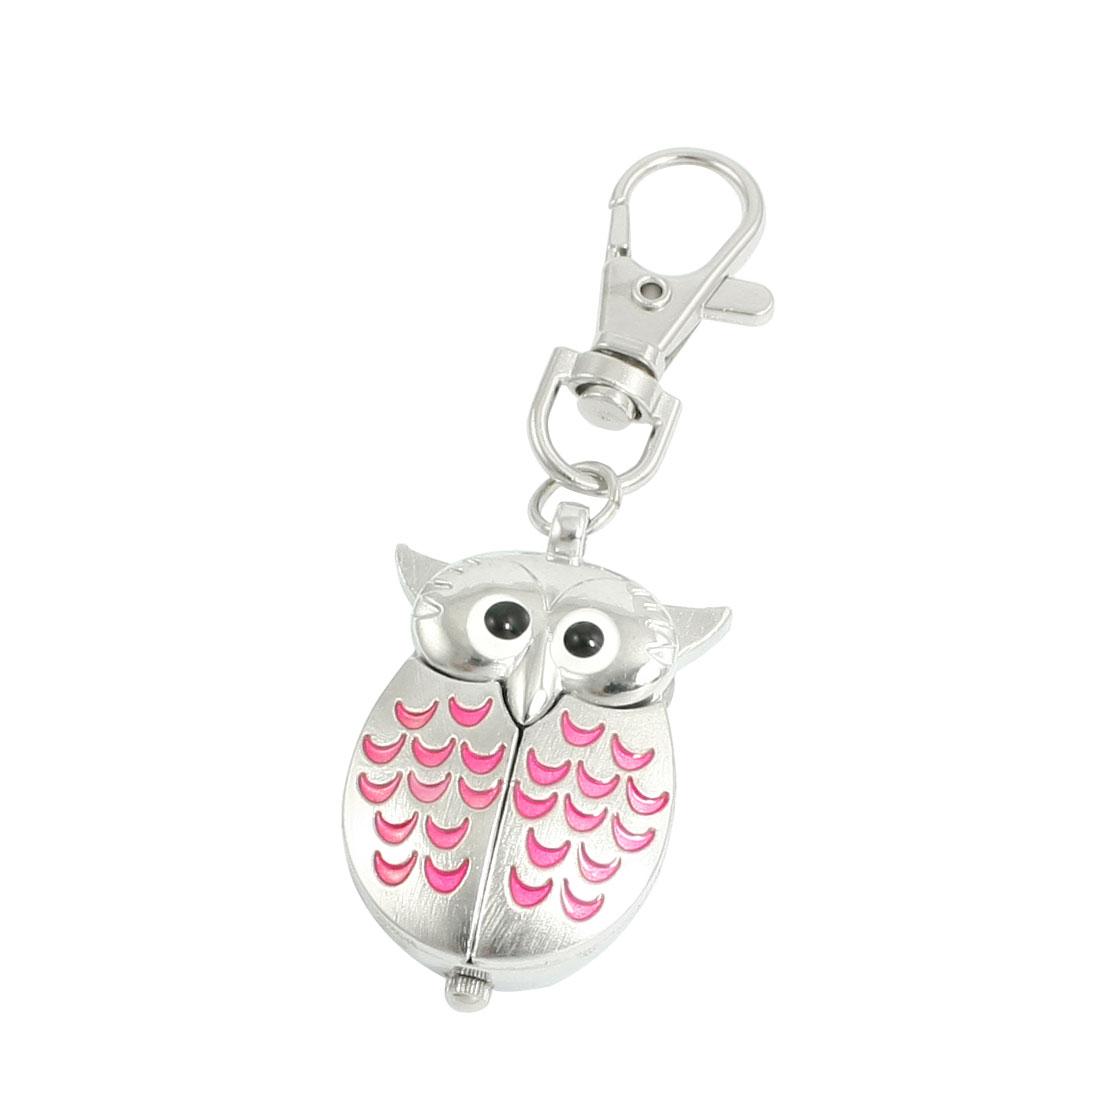 Silver Tone Pink Metal Owl Pendant Knob Adjustable Time Keyring Watch